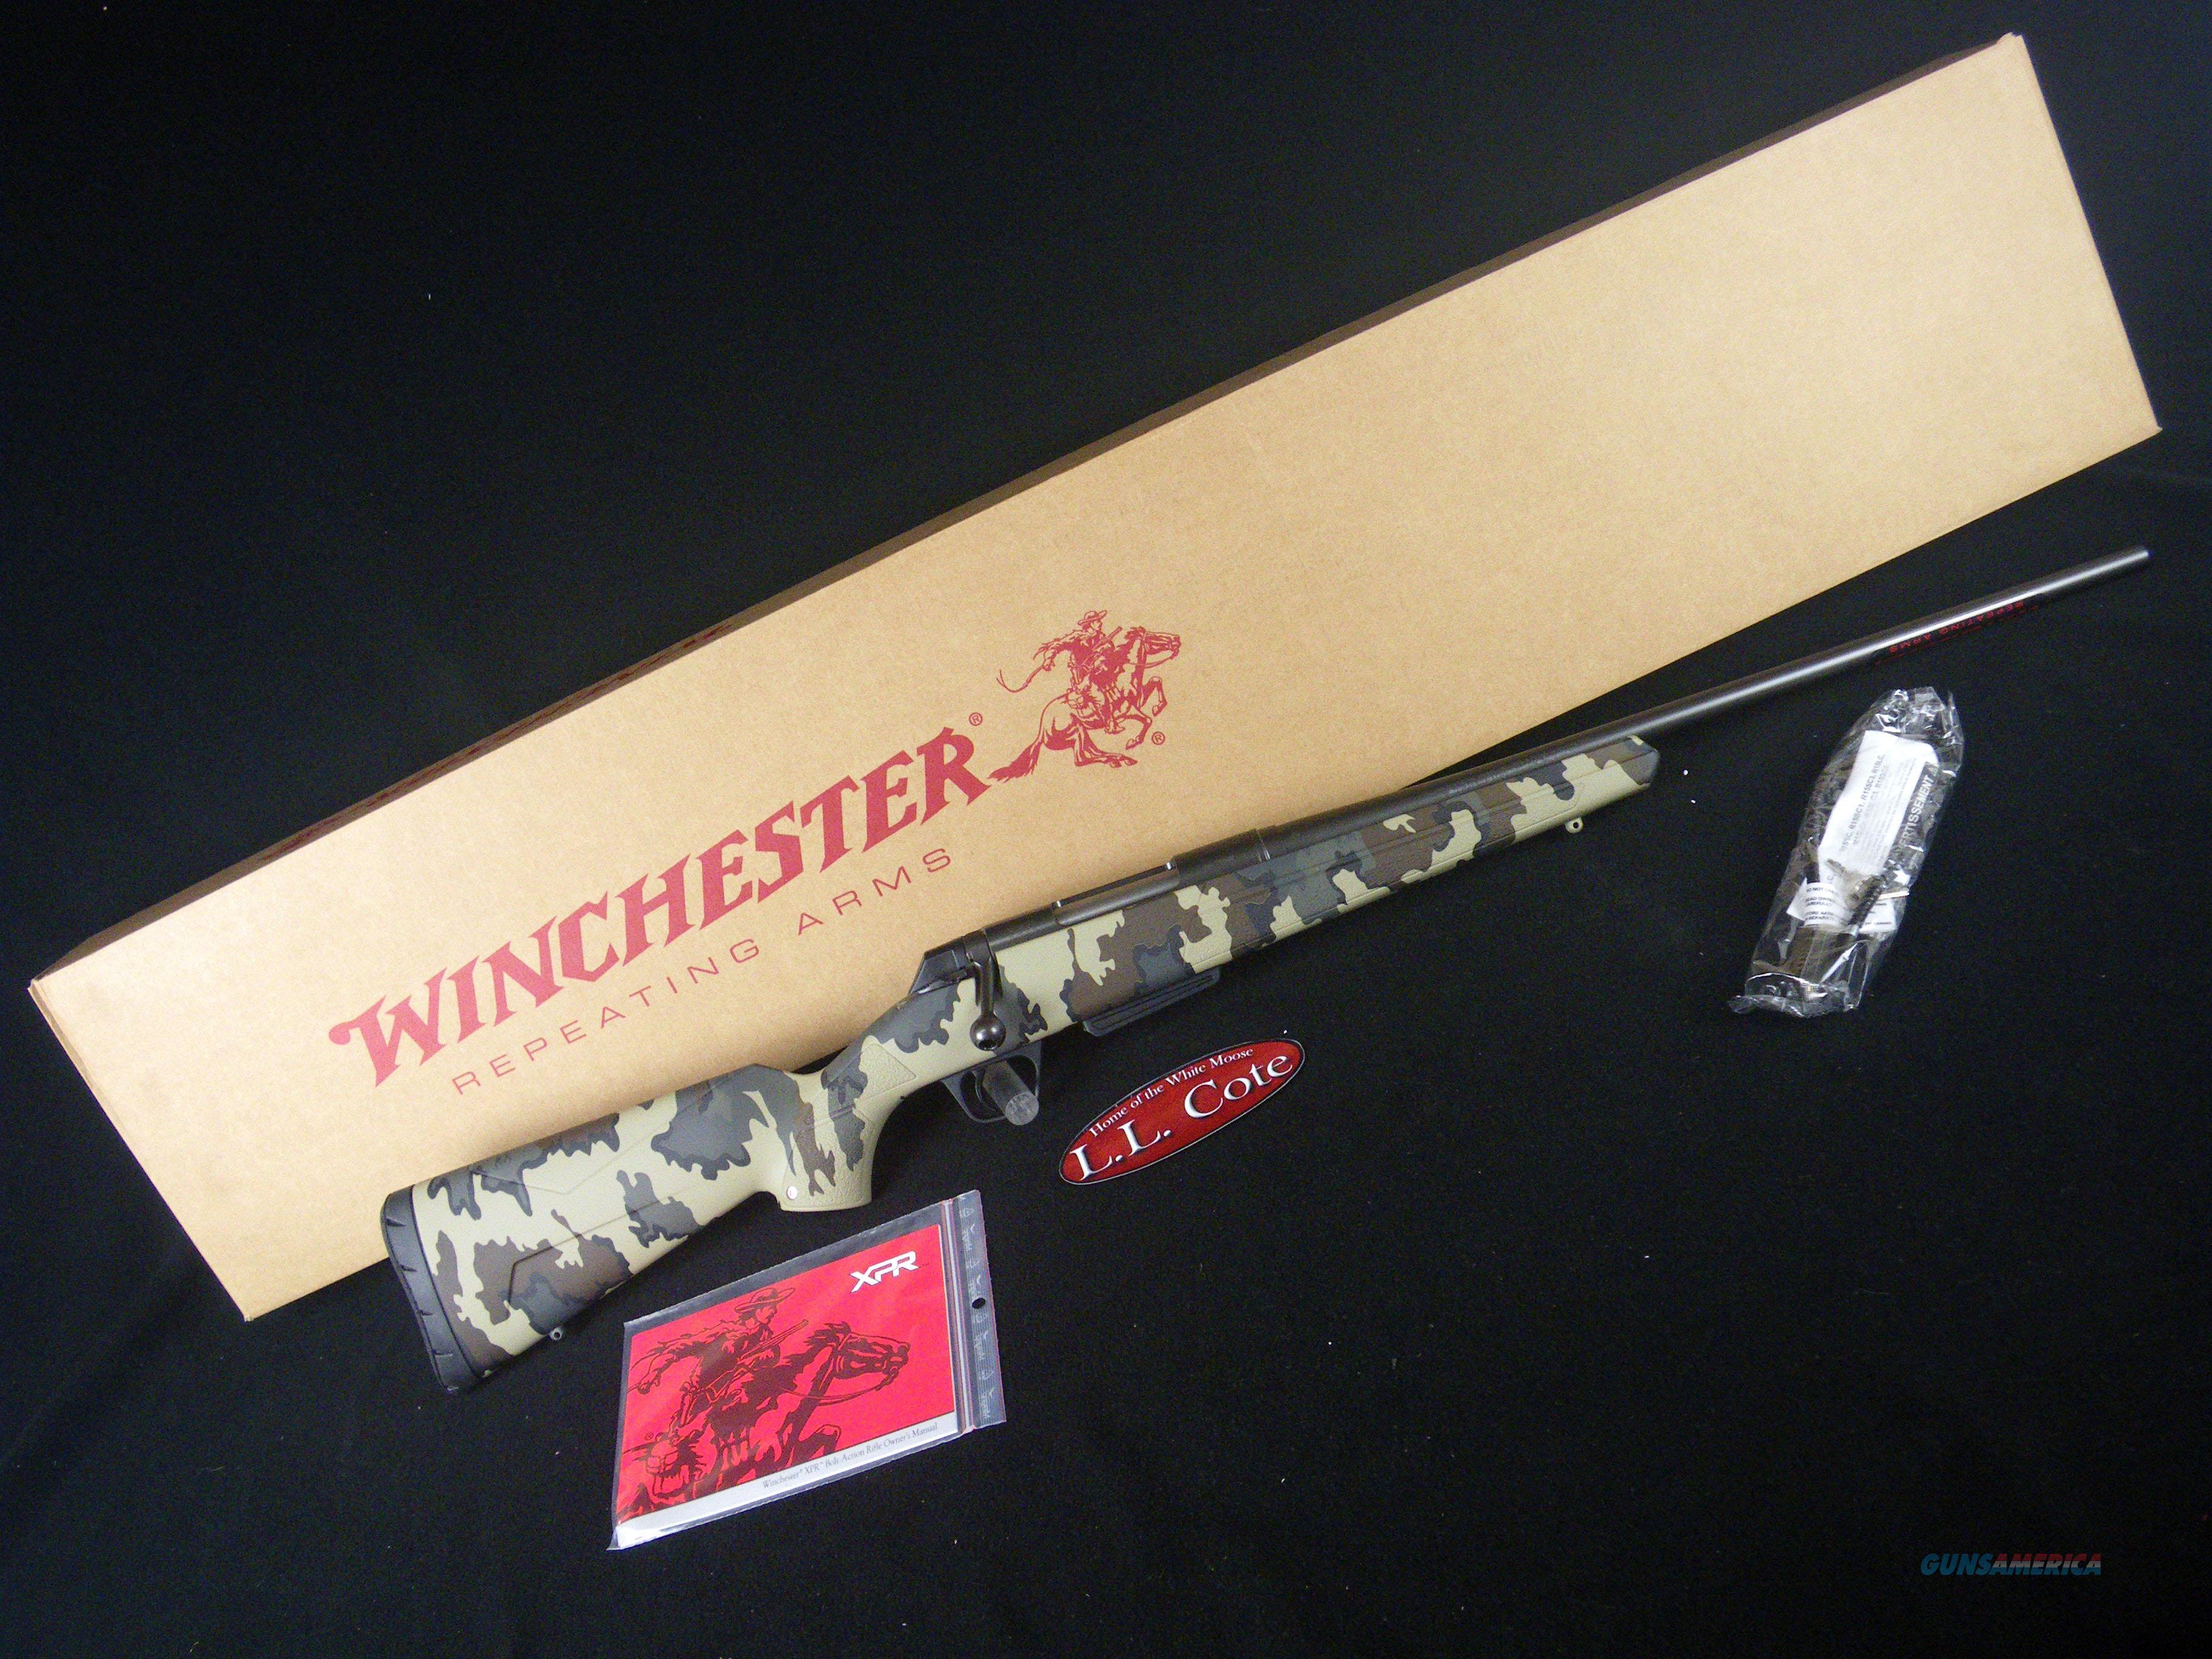 "Winchester XPR Hunter Kuiu Vias 243 Win 22"" NEW 535713212  Guns > Rifles > Winchester Rifles - Modern Bolt/Auto/Single > Other Bolt Action"